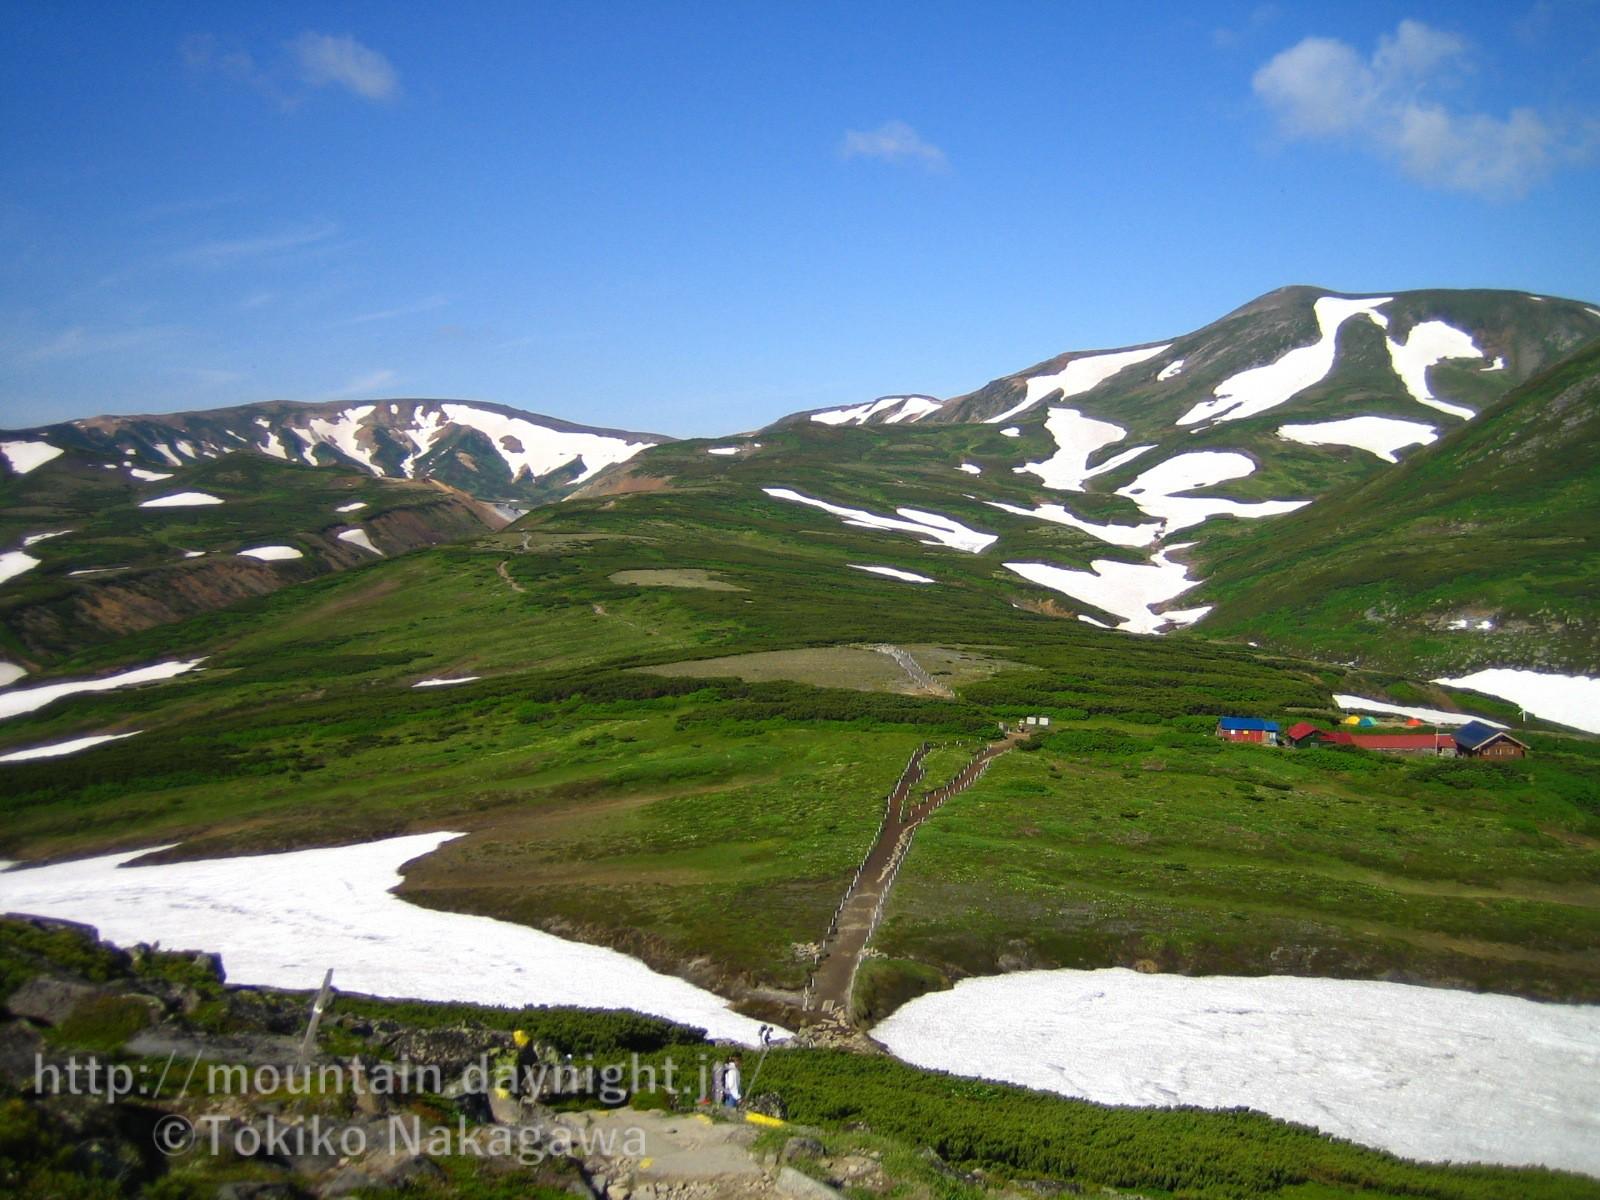 大雪山・黒岳周辺の風景